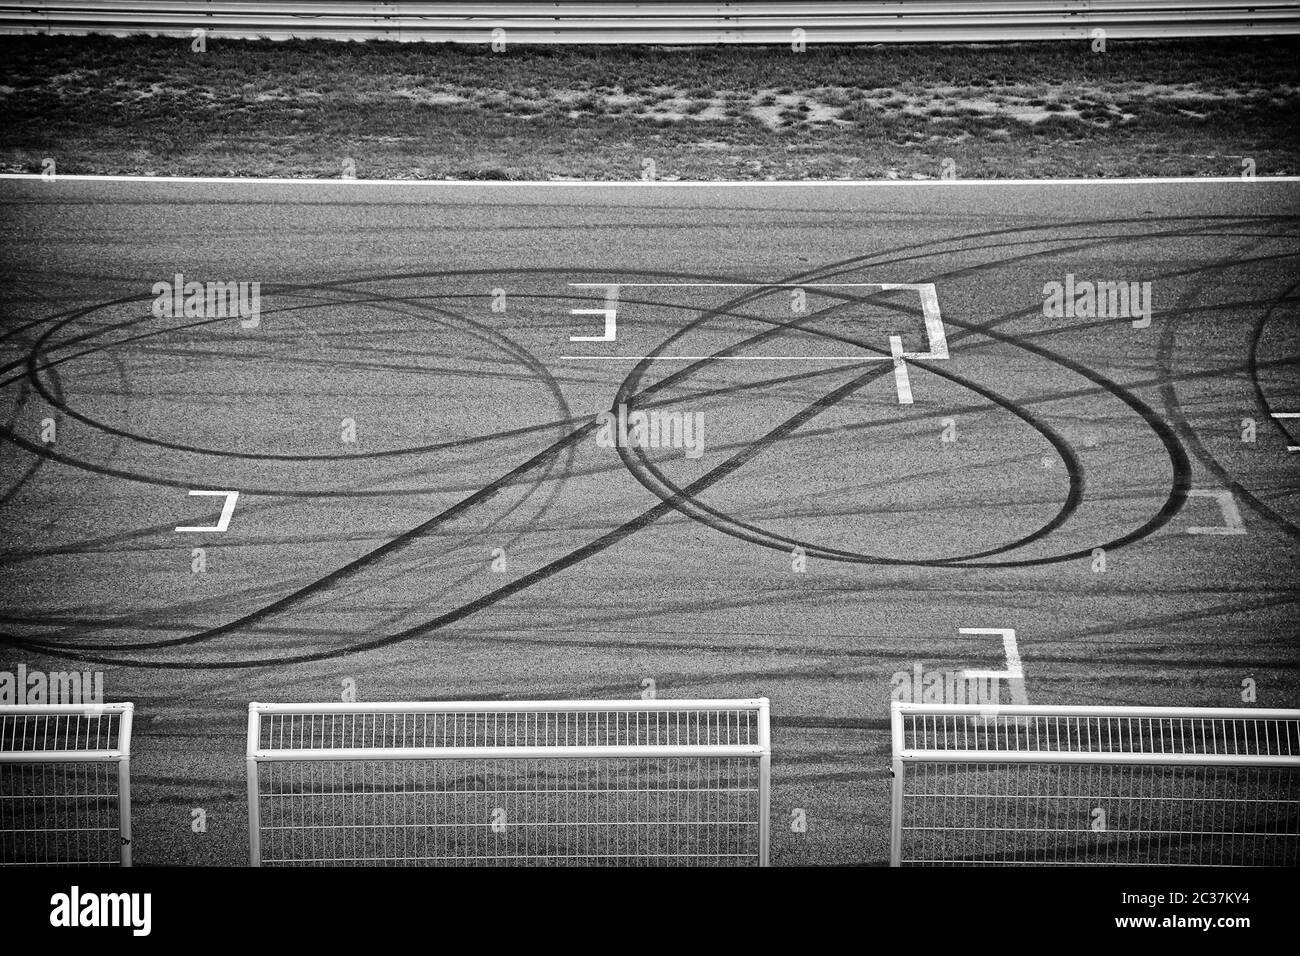 Stromkreis road racing reifen Marke Detail auf dem Asphalt Stockfoto